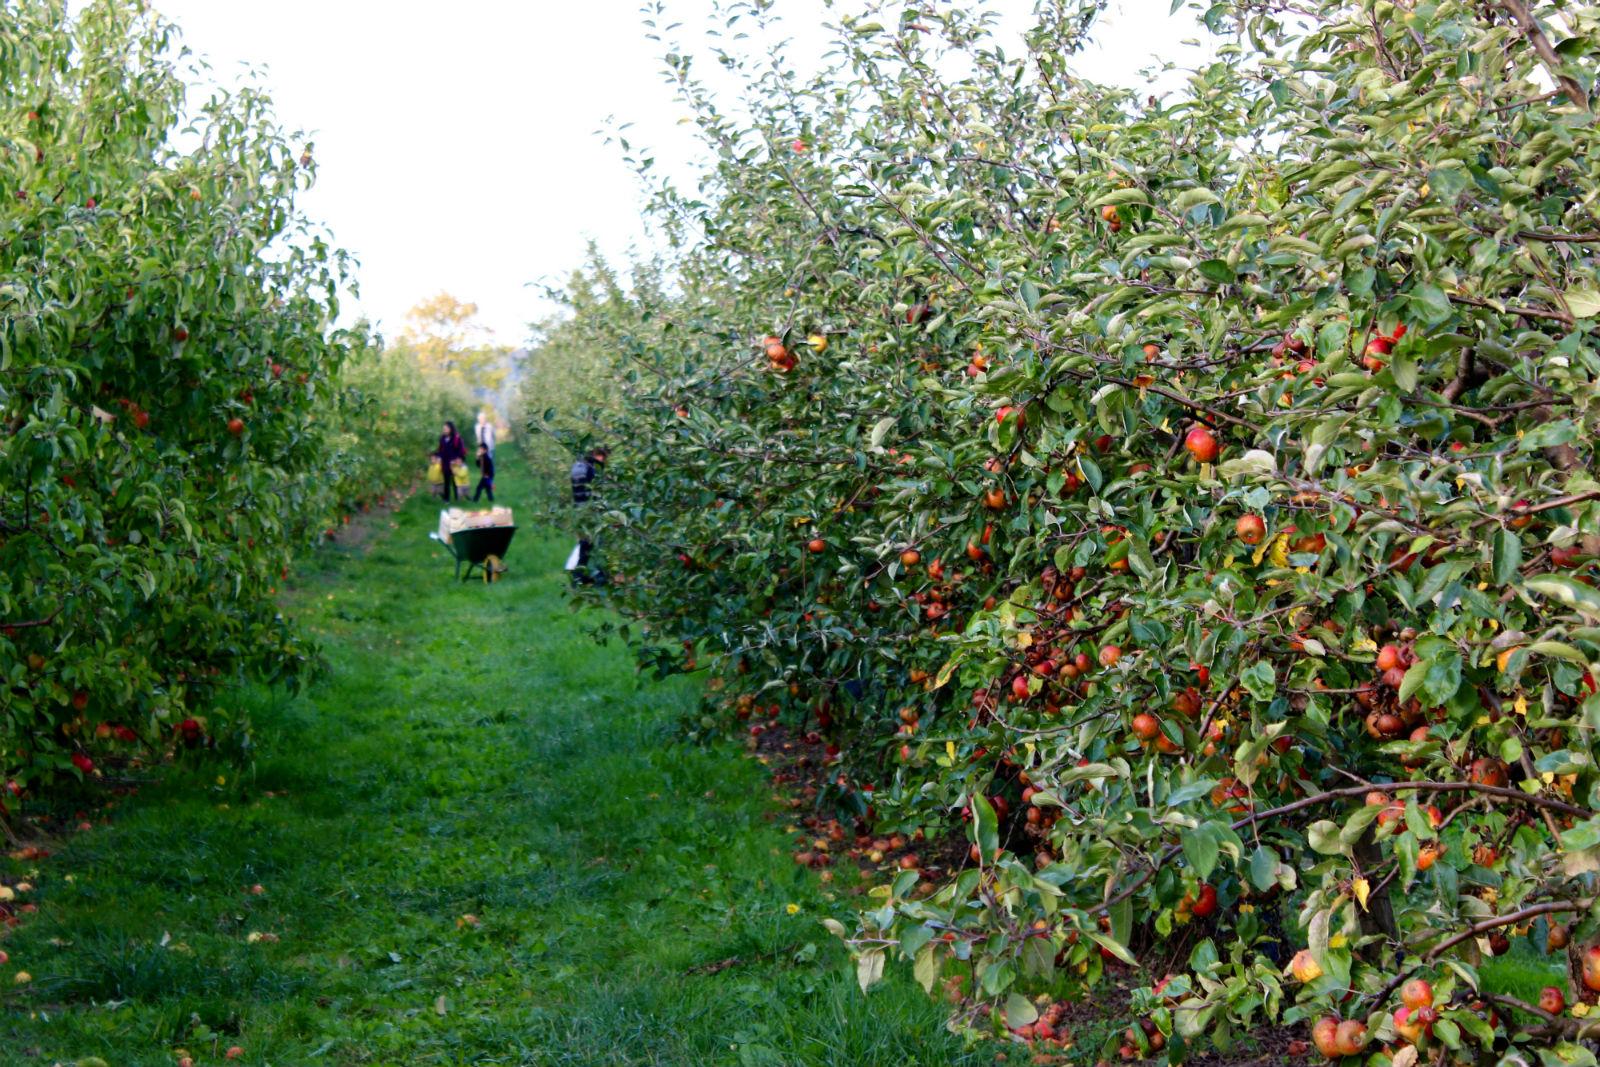 HiP Paris blog. Cueillette de Gally. Spend an afternoon lost amongst the apples'